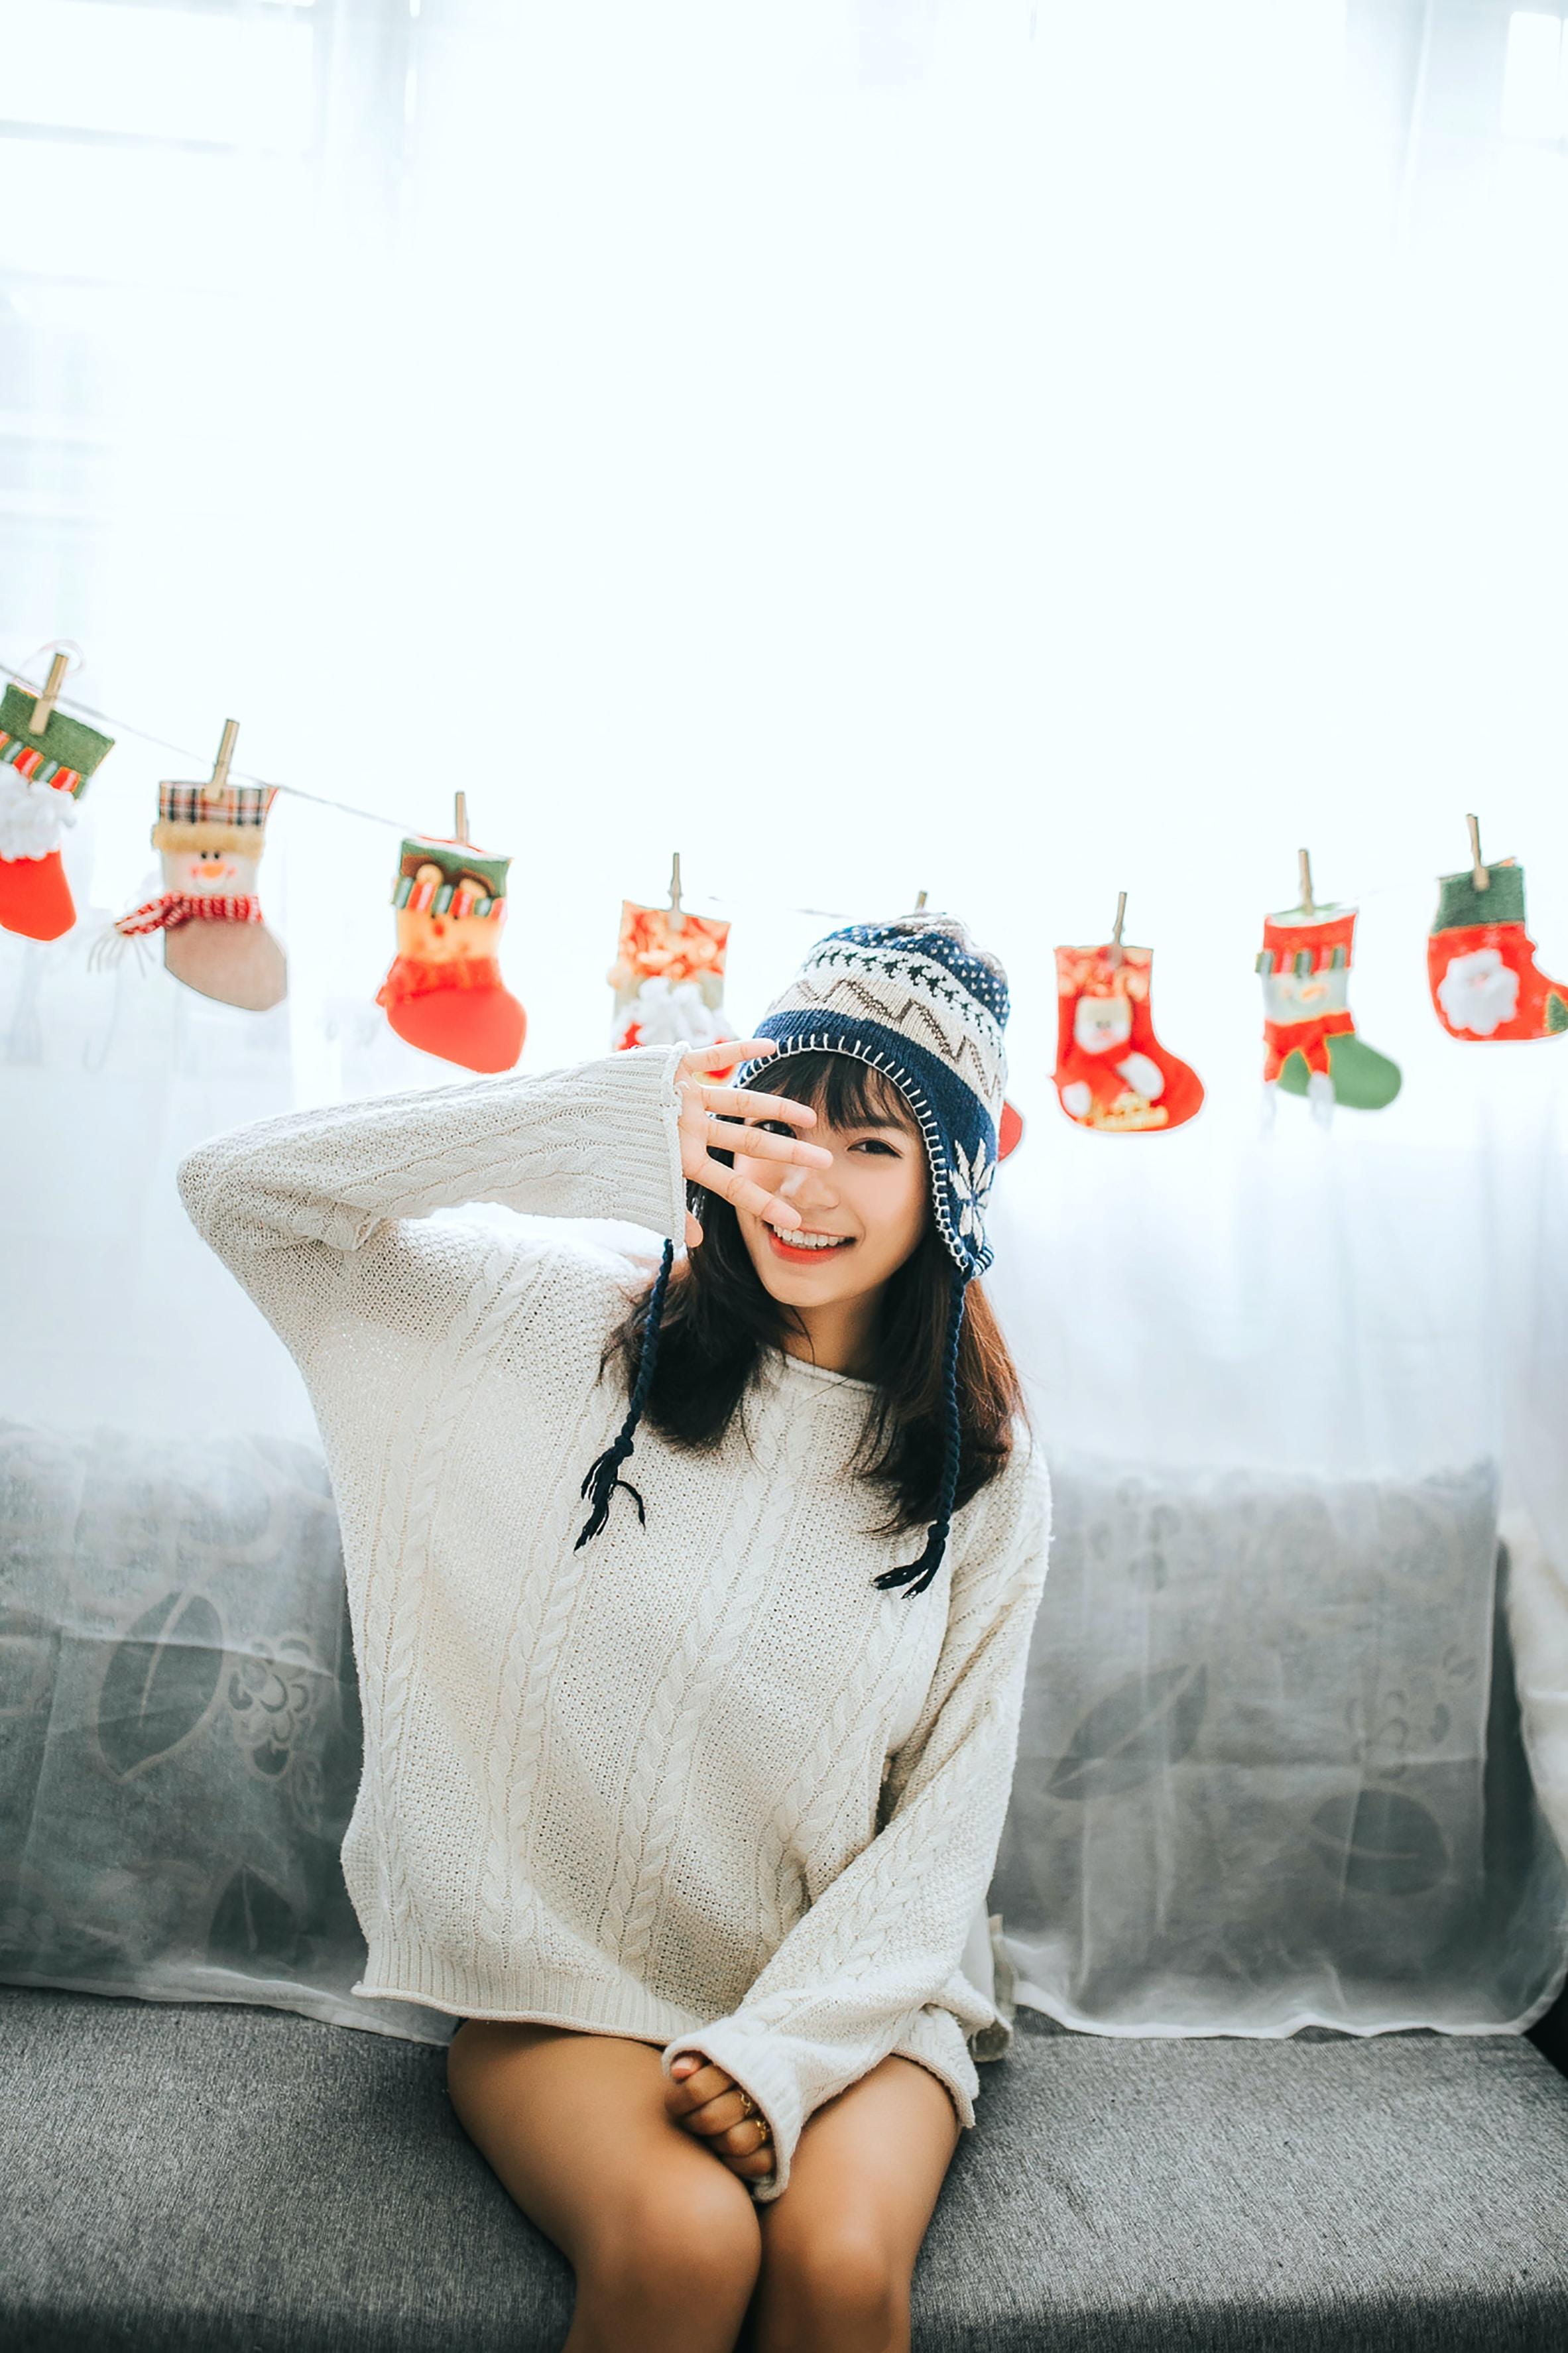 woman wearing white sweater sits on gray fabric sofa